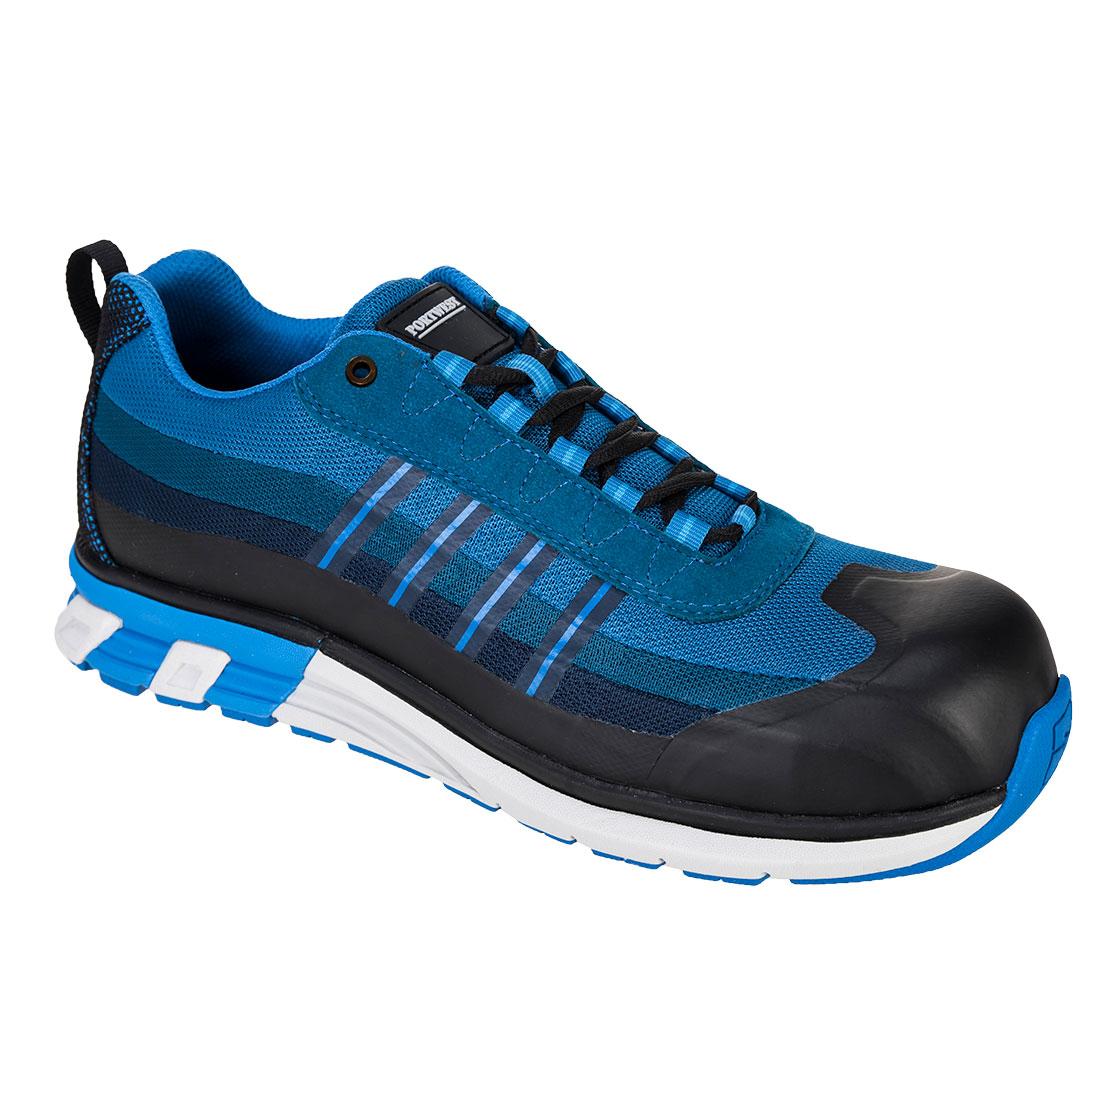 OlymFlex London SBP AE Trainer Blue/Black 44